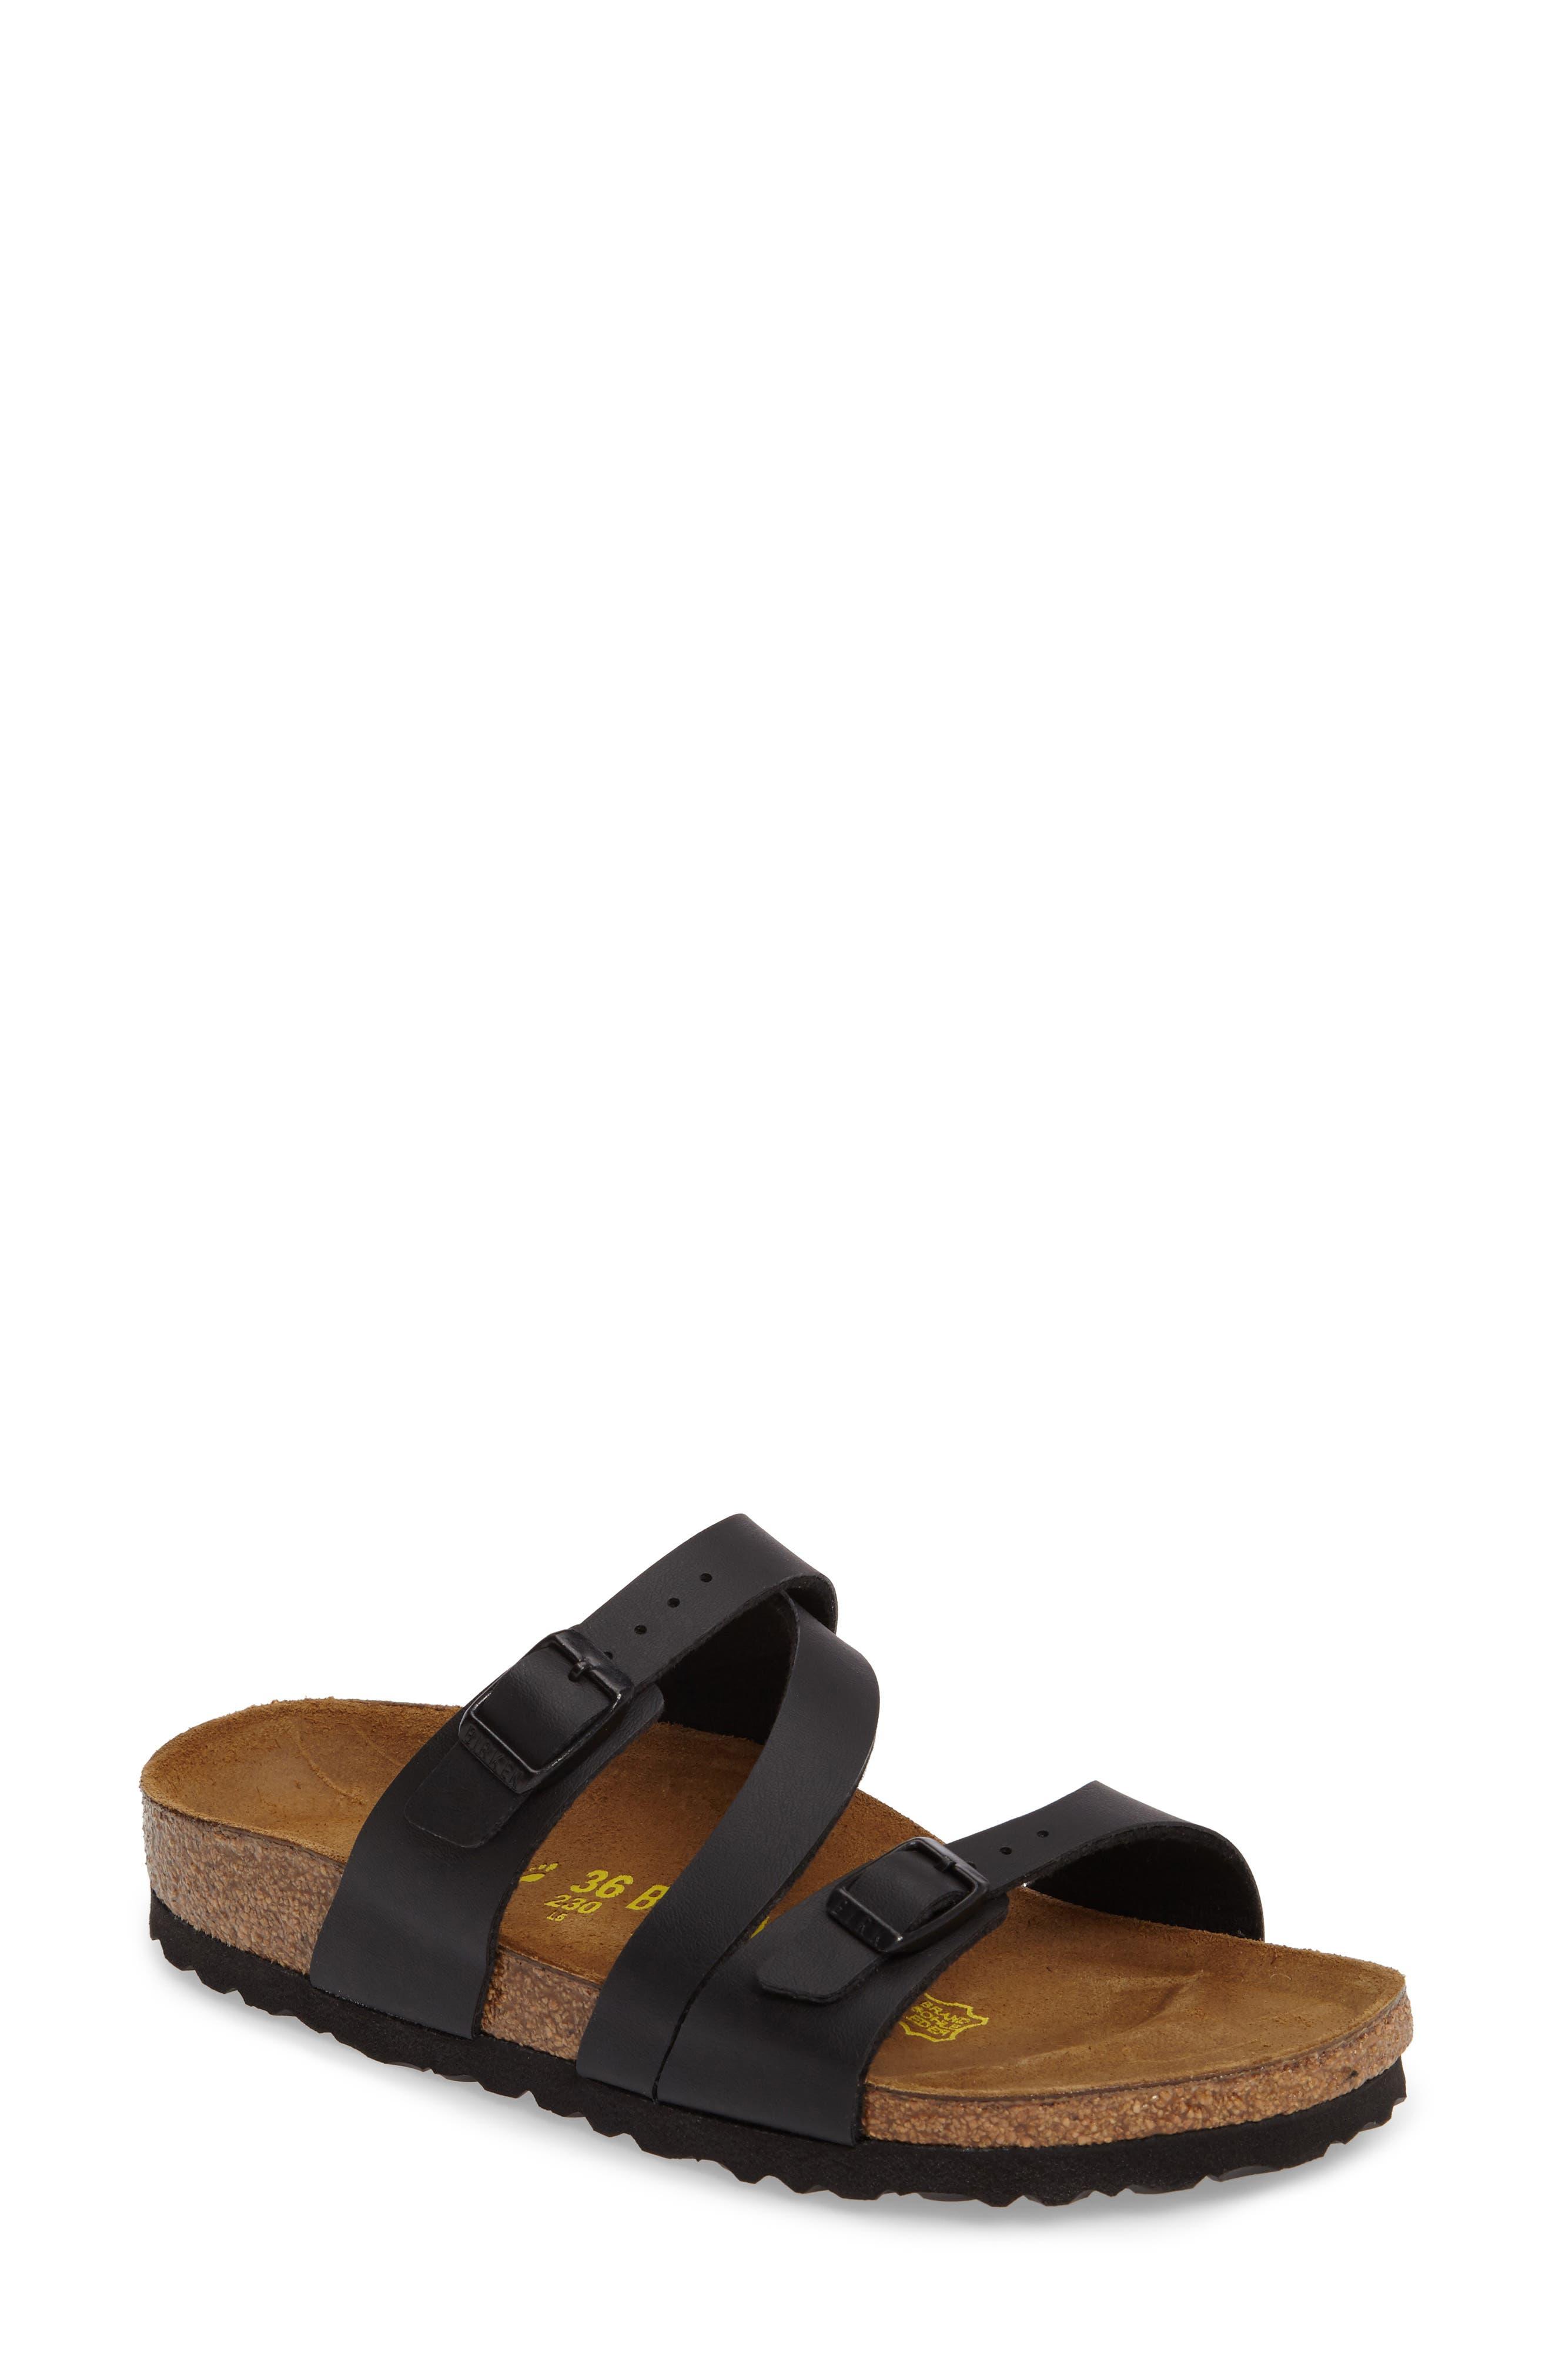 Main Image - Birkenstock Salina Slide Sandal (Women)